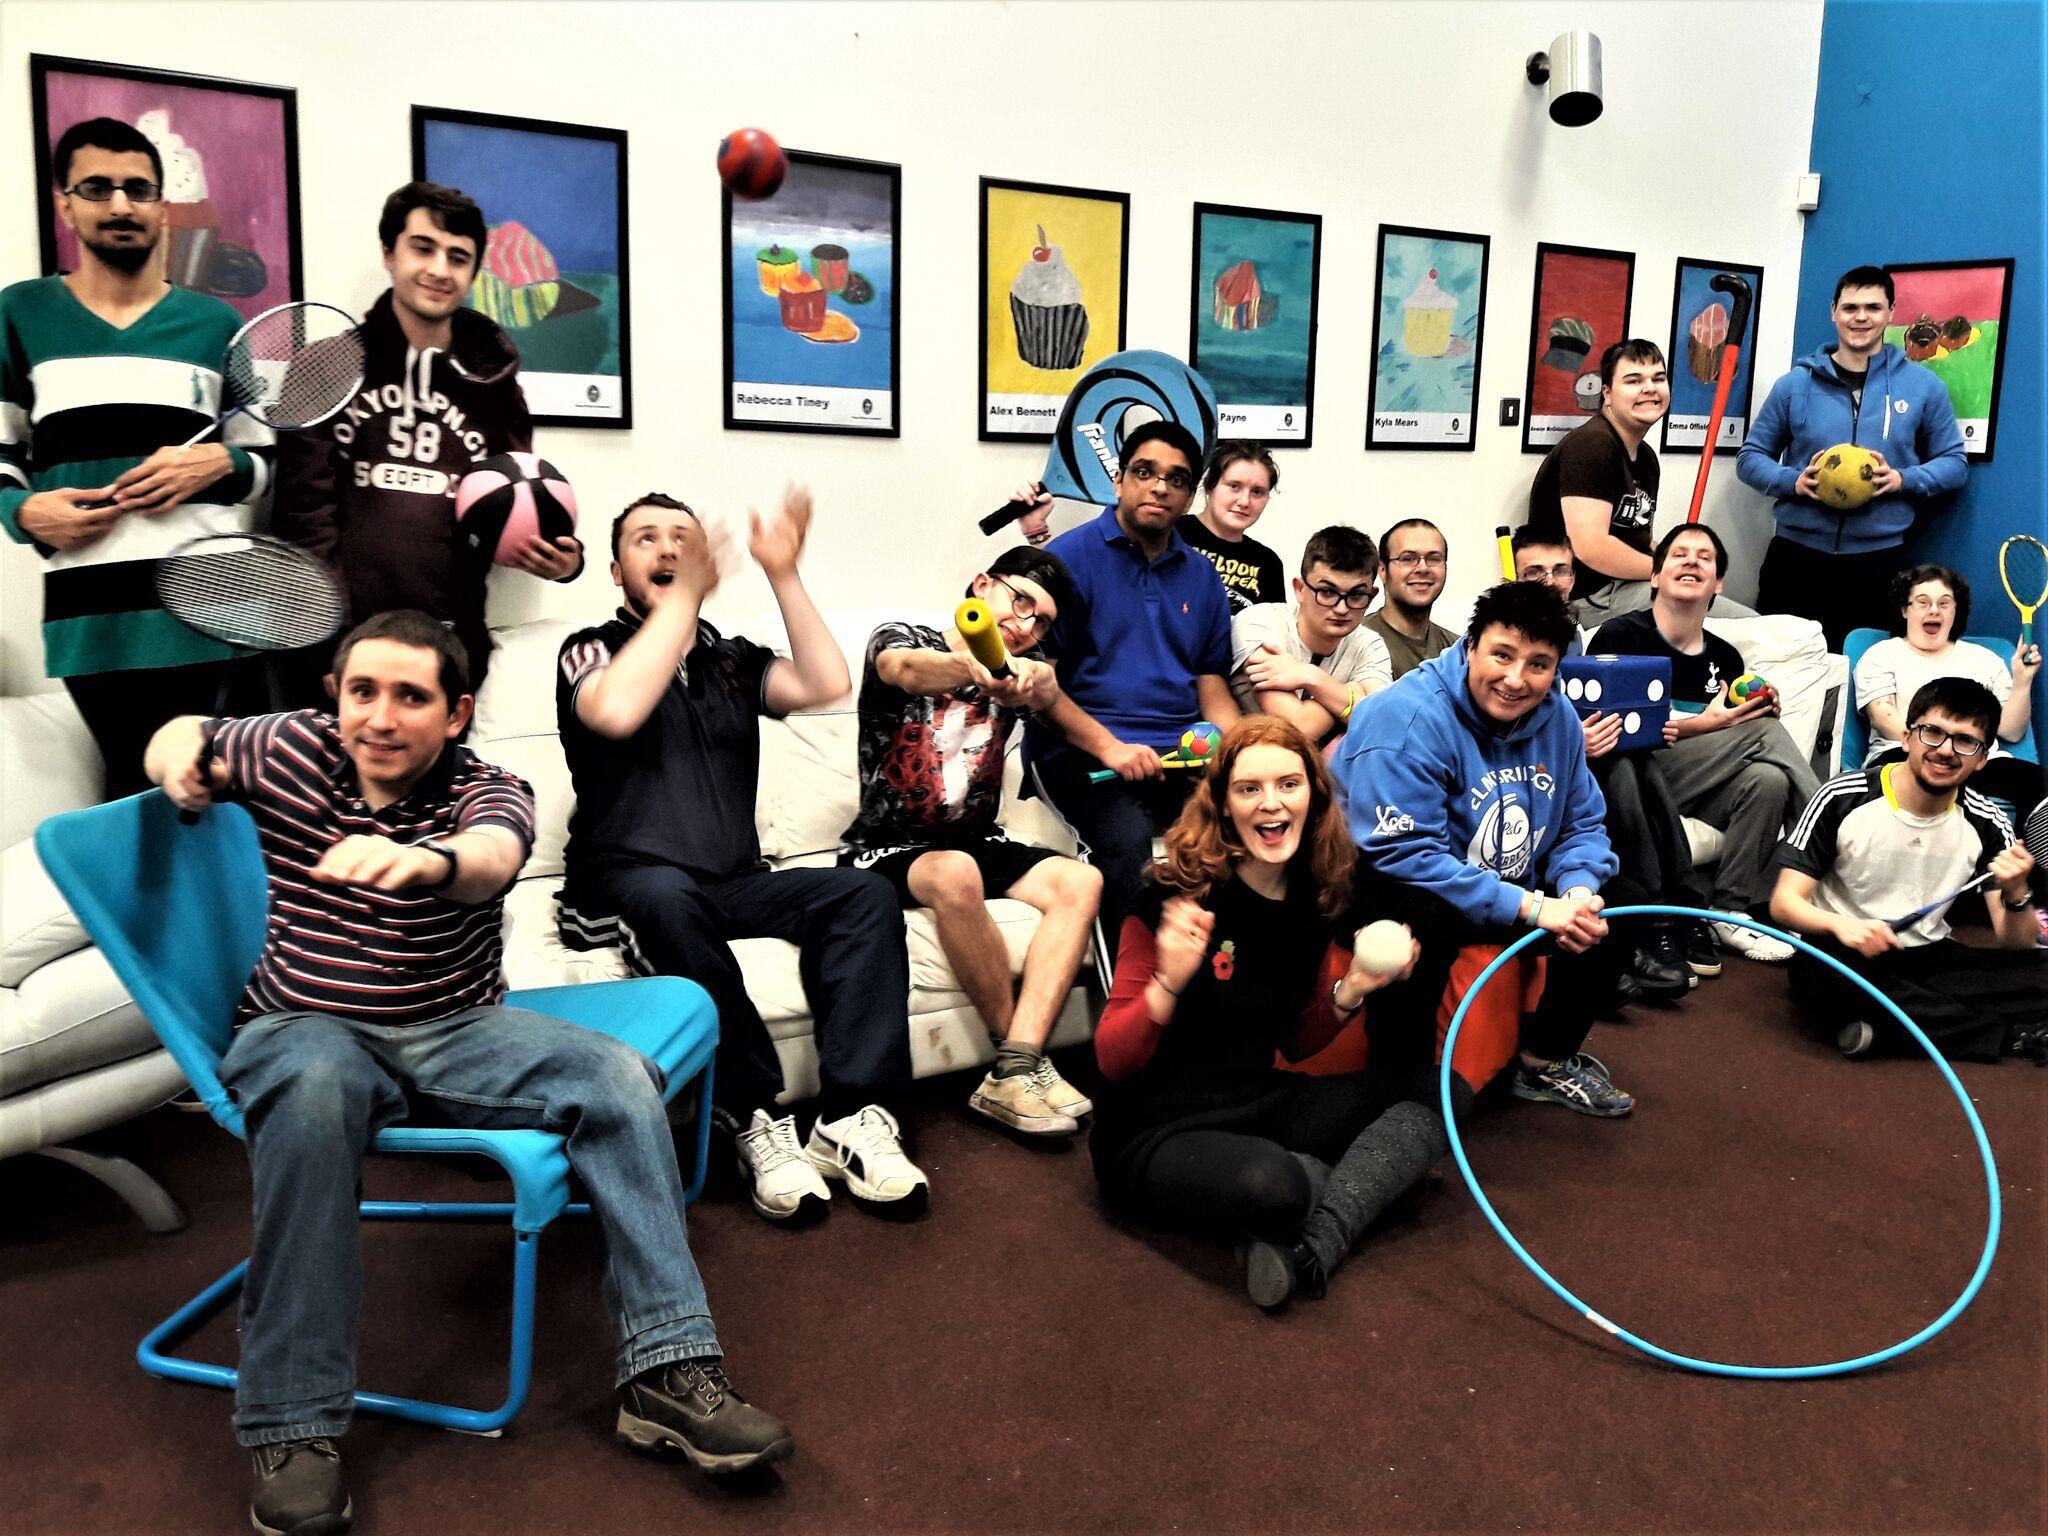 Elmbridge Community Link Sports Coaching Fun and Games at Walton Youth Centre, Hersham Rd, Walton-on-Thames Surrey